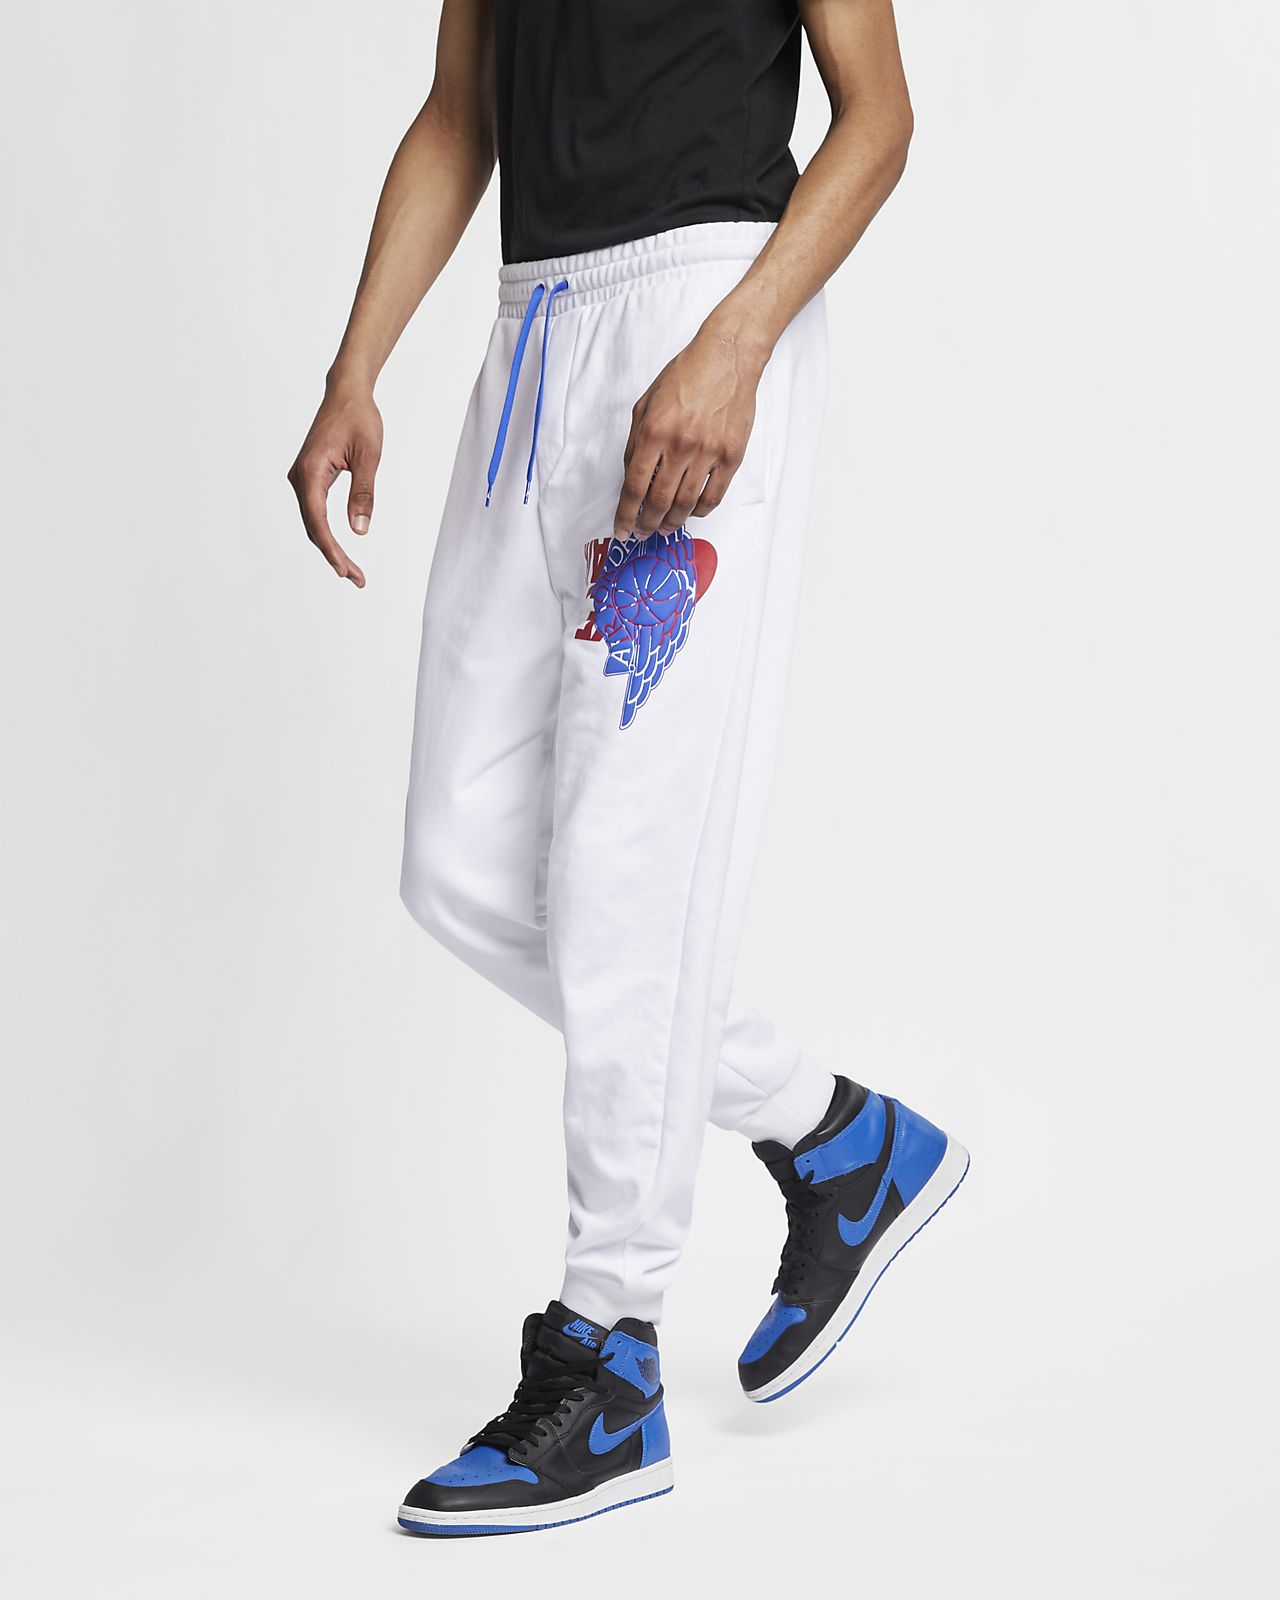 5a5b7f1ad84 Jordan Jumpman Wings Classics Men's Pants. Nike.com